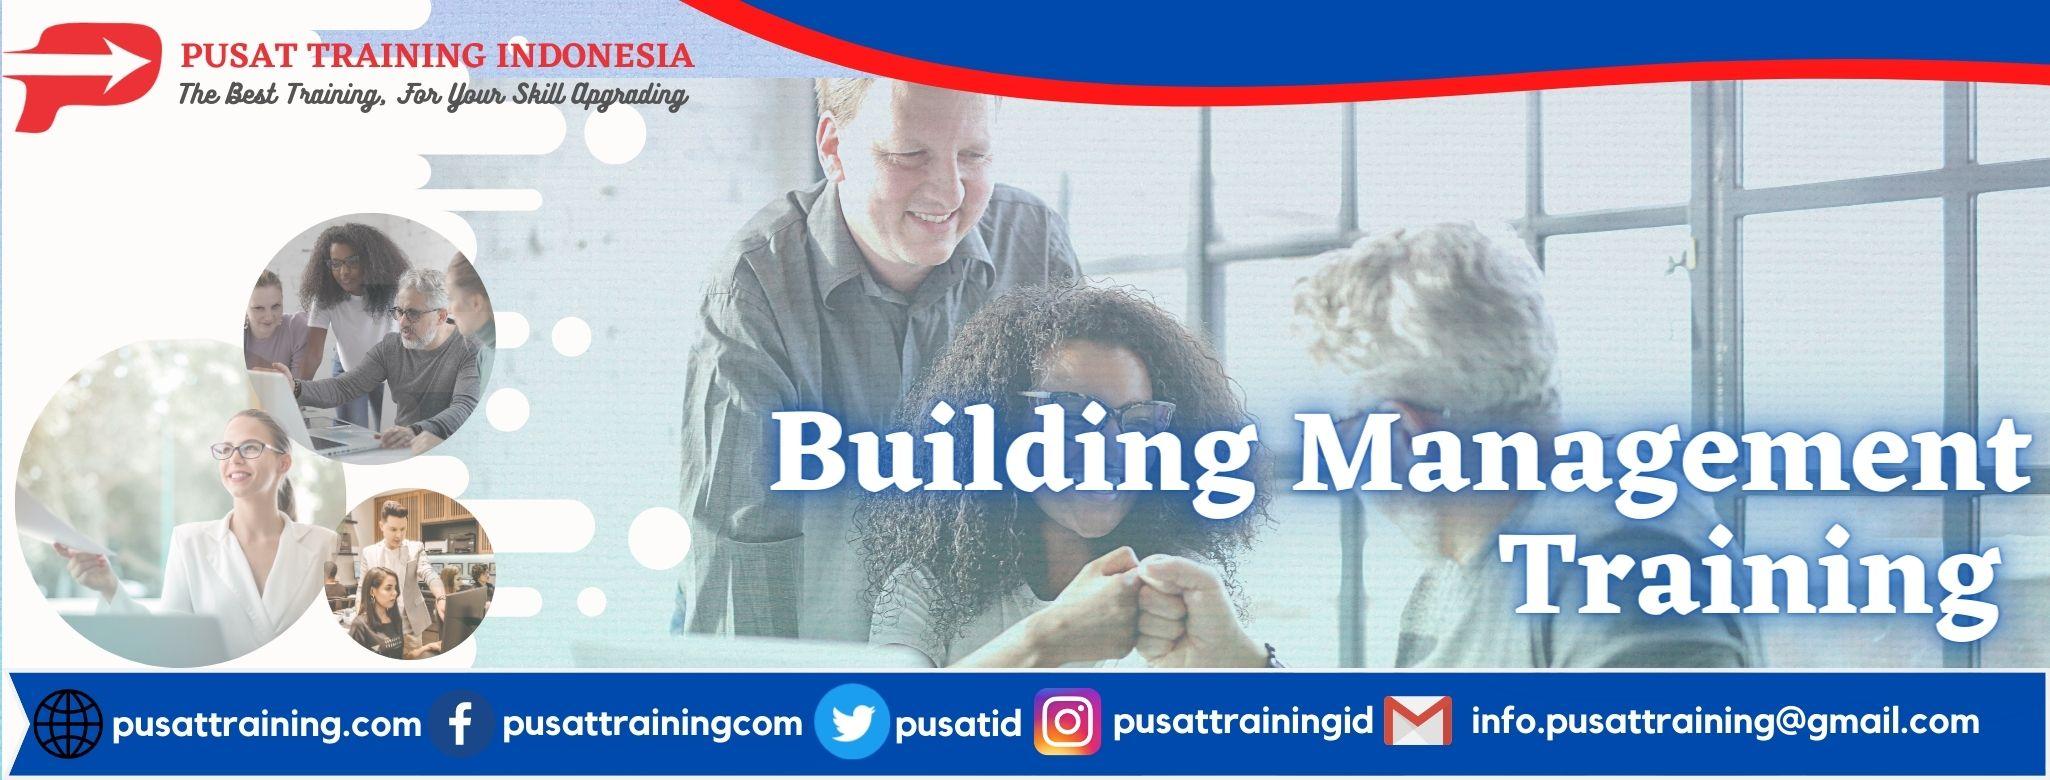 Building-Management-Training